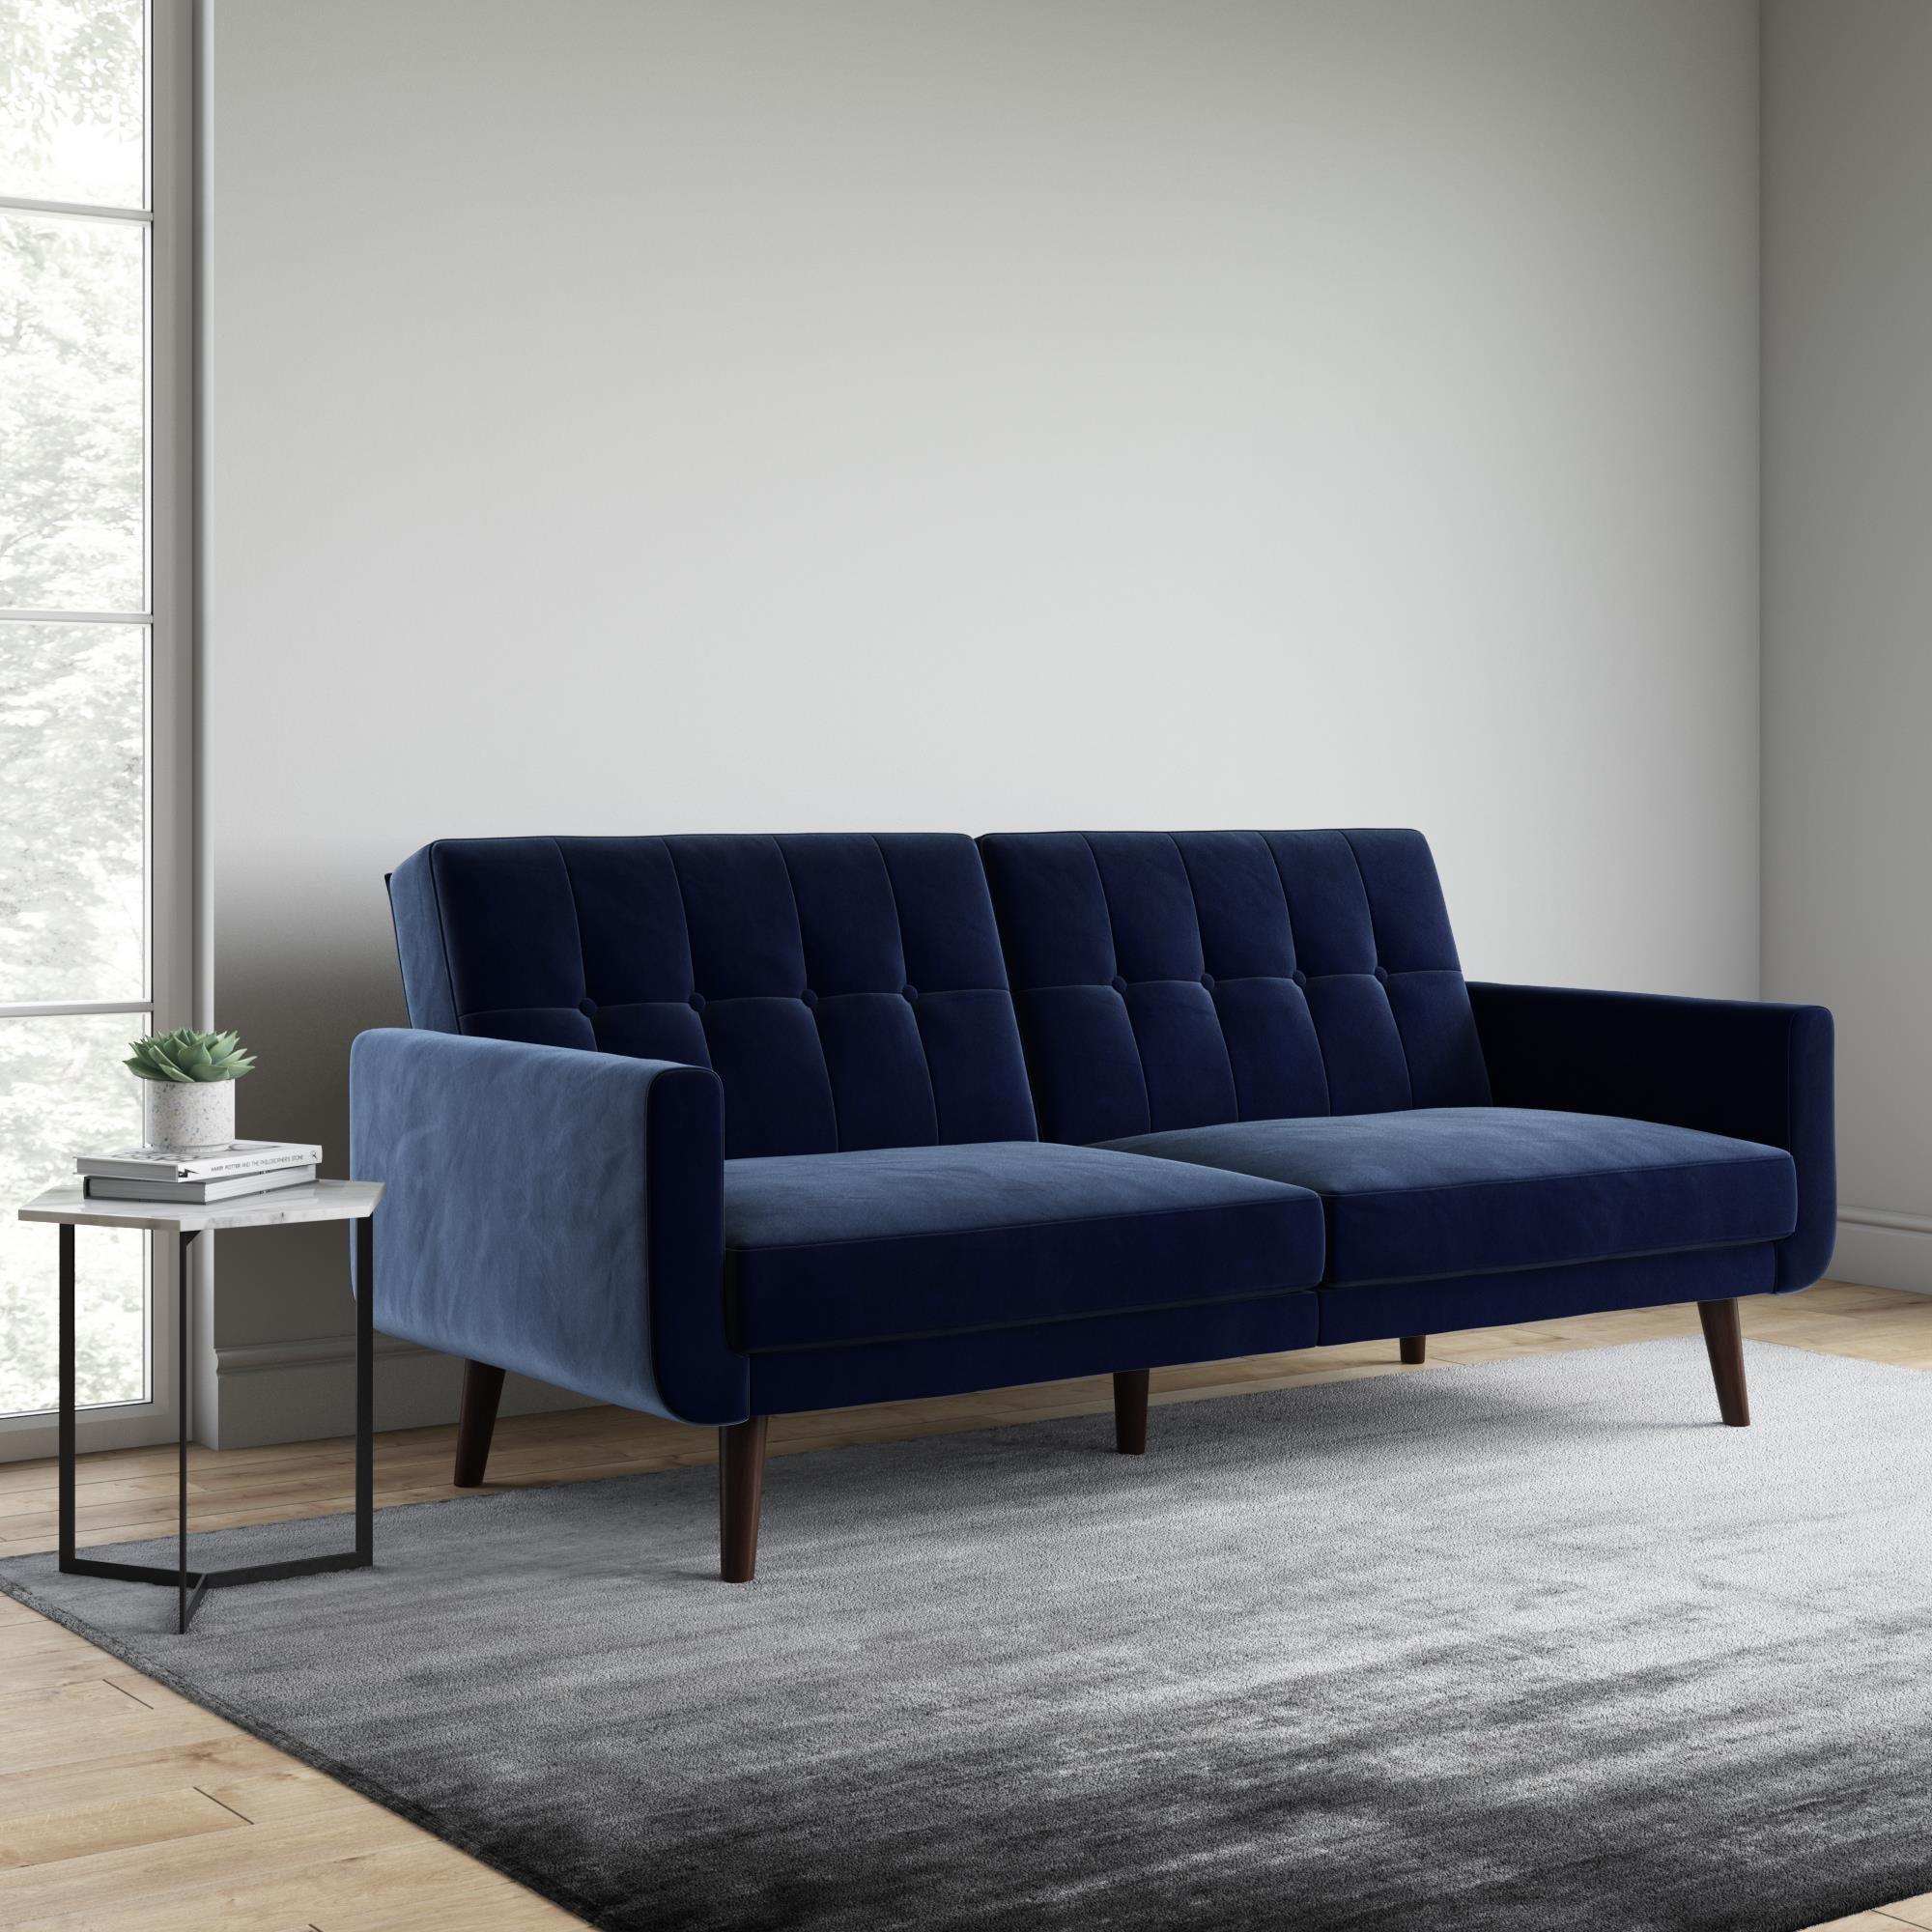 Blue velvet futon with dark wood legs